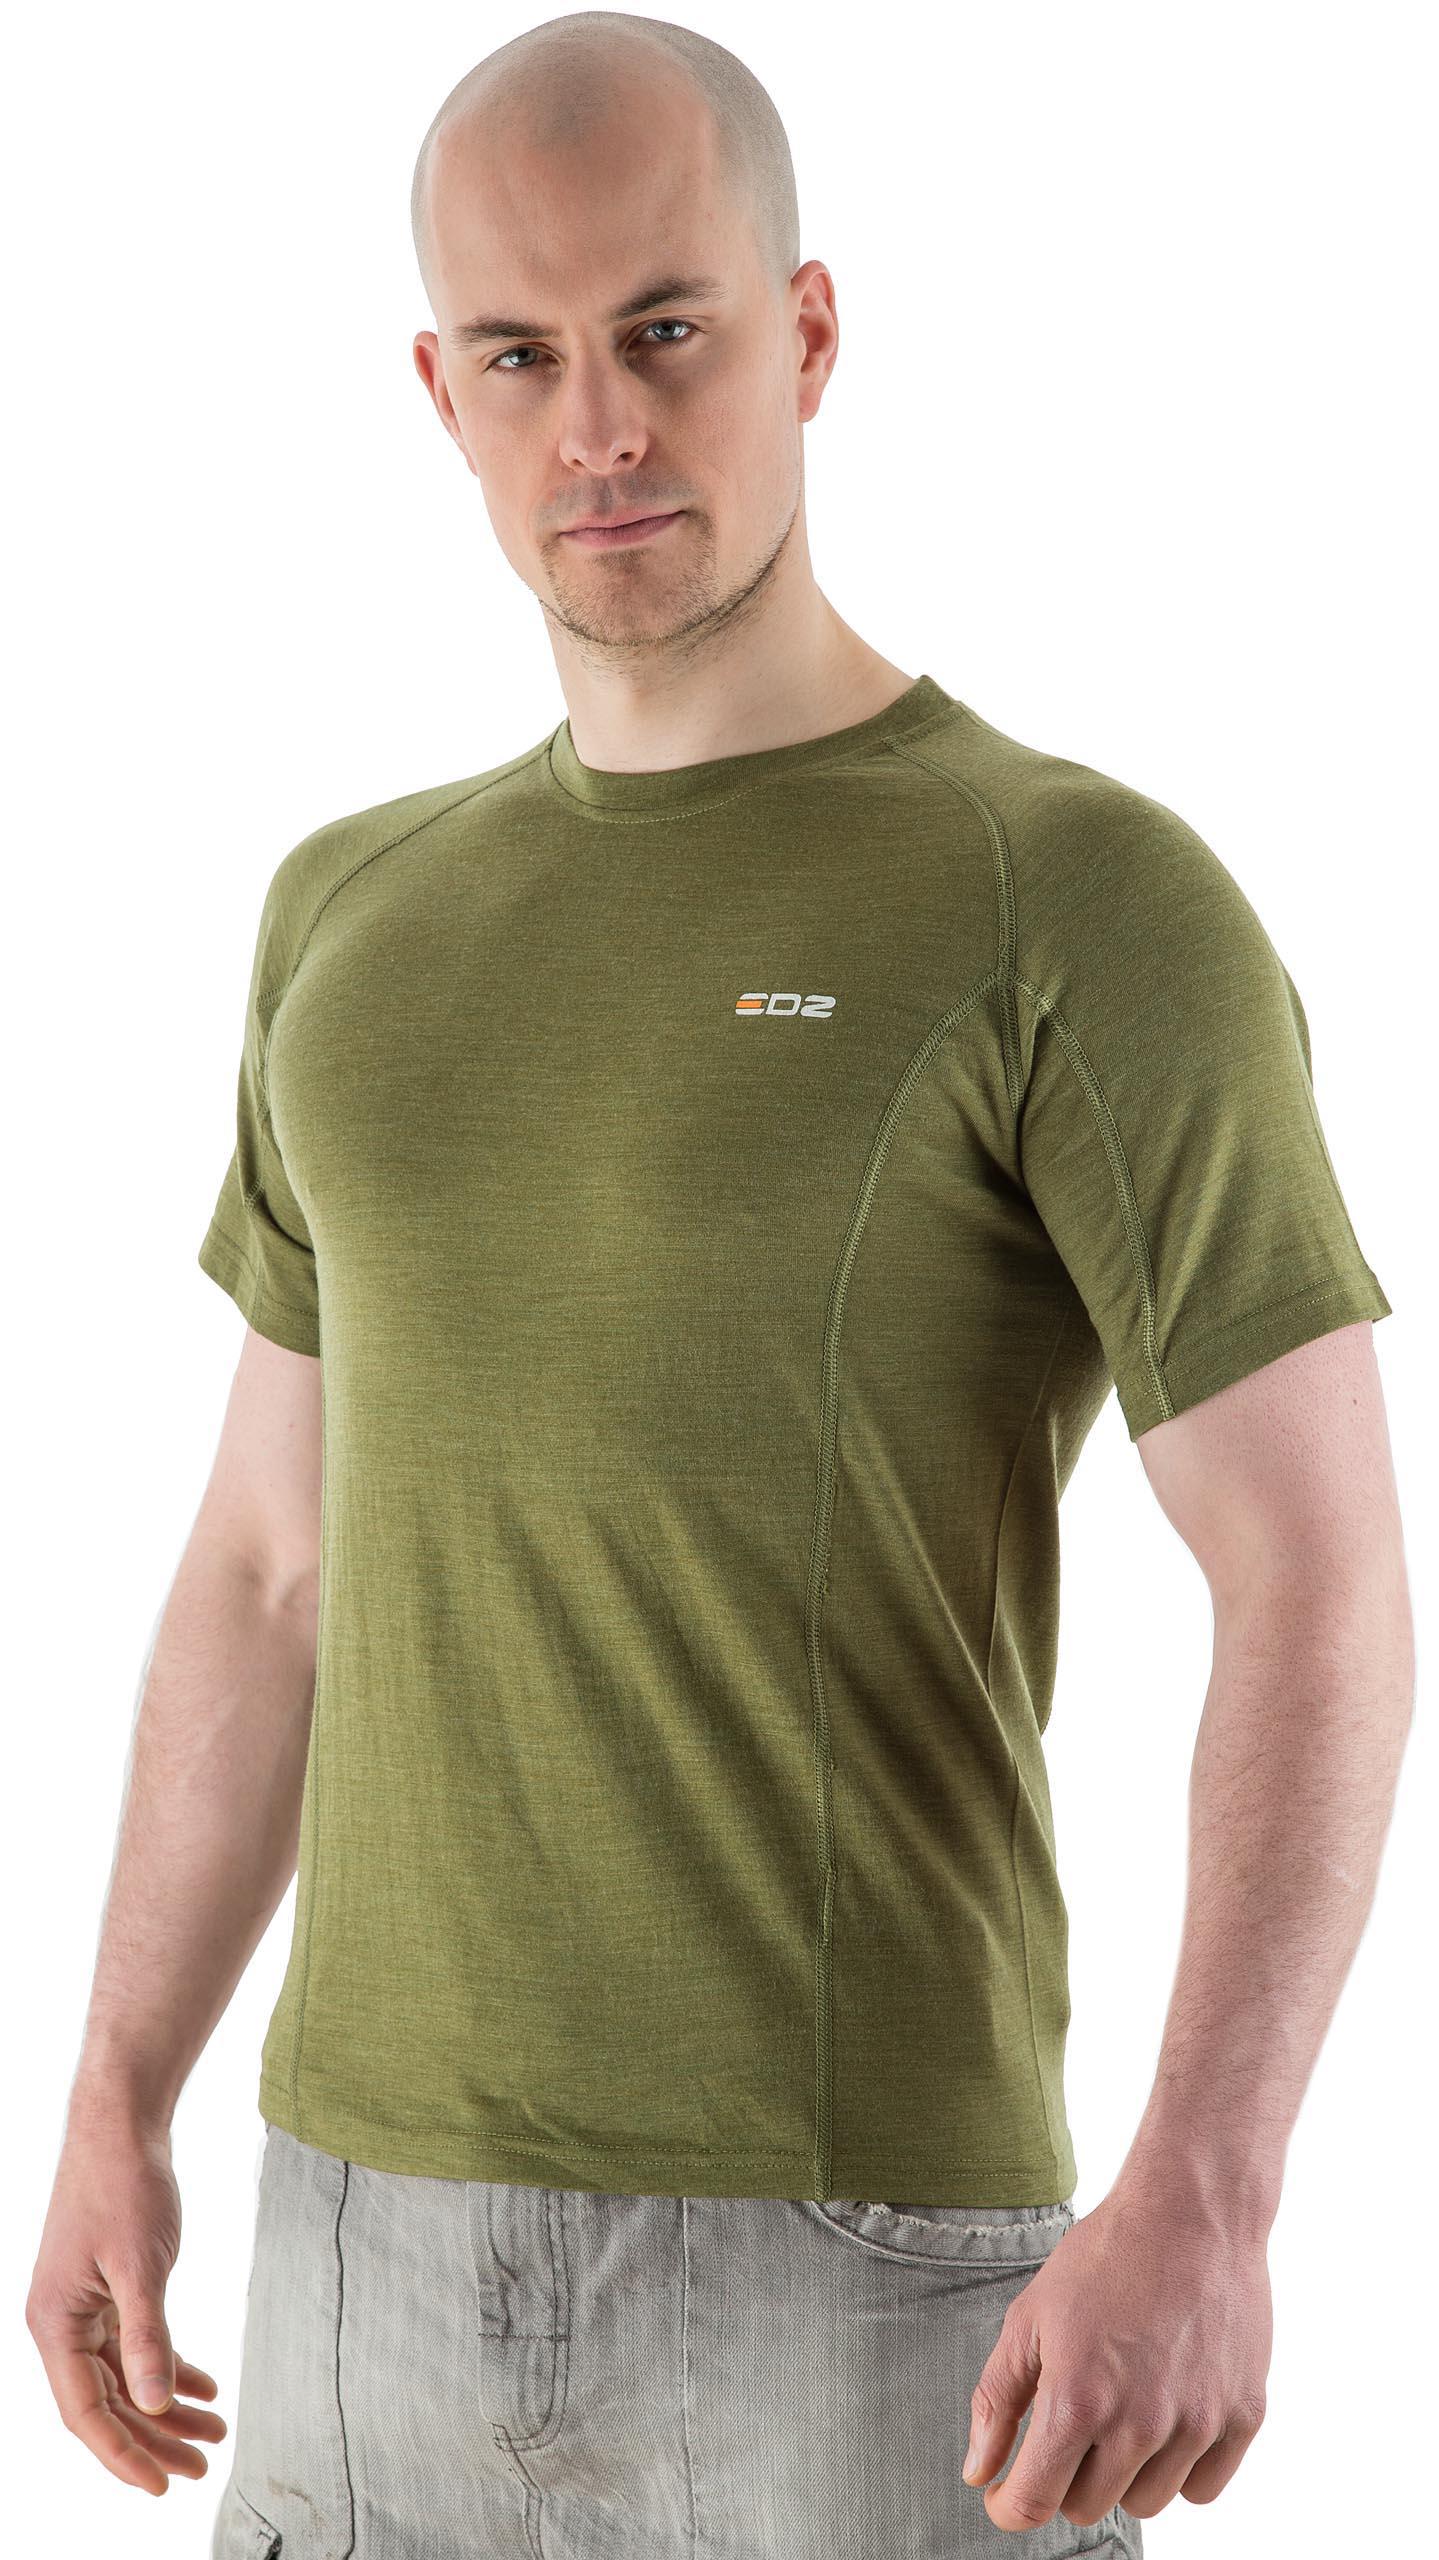 edz 200g men 39 s merino wool base layer t shirt olive green. Black Bedroom Furniture Sets. Home Design Ideas